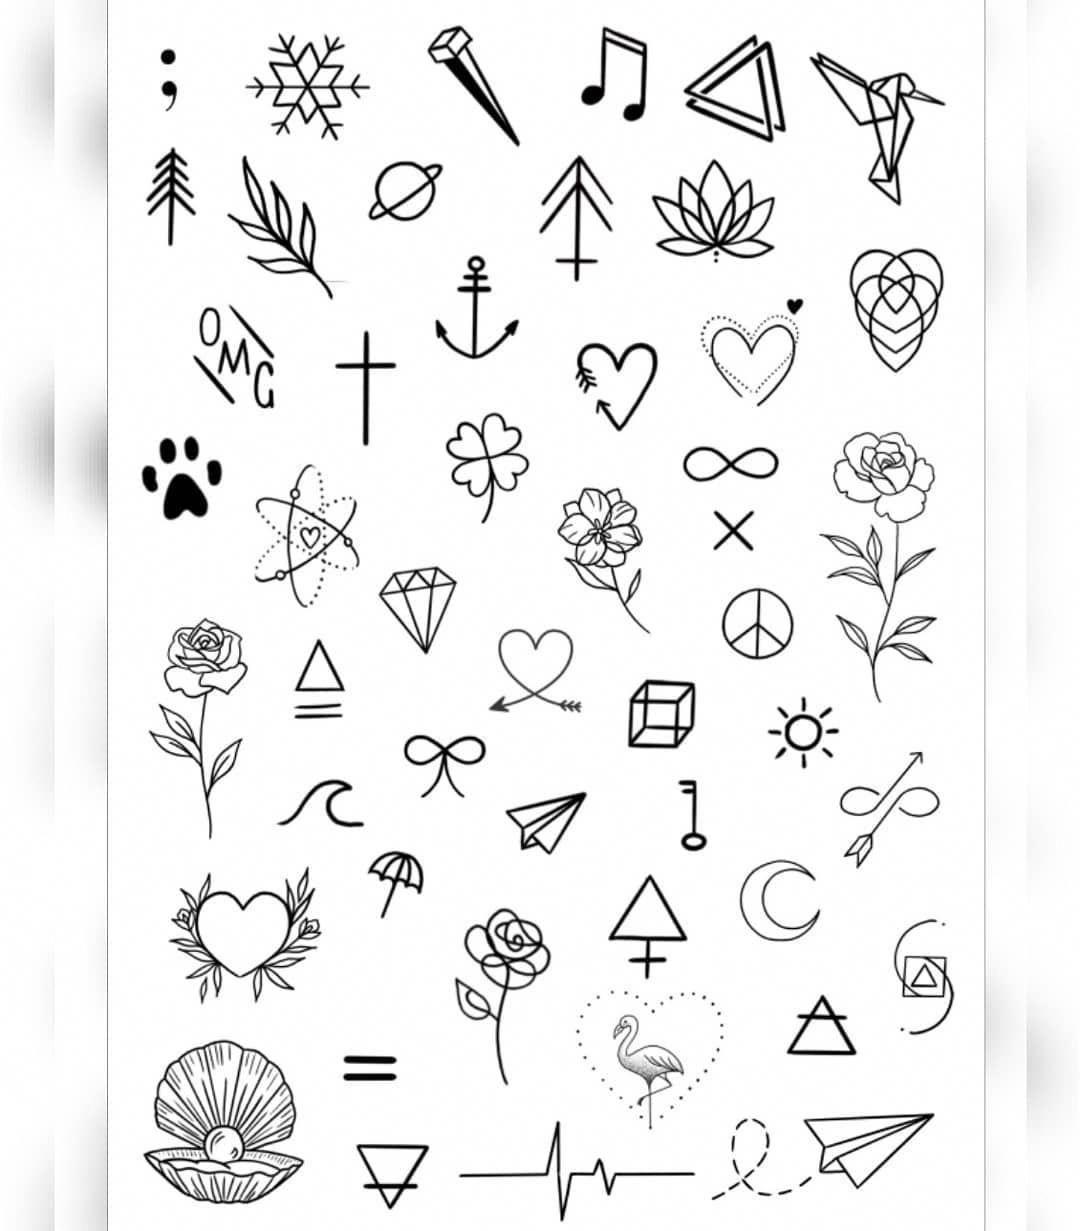 Amazon Com Temporary Tattoos Paper Waterproof Tattoo Sticker 2 Pcs 00186 8 4 Clothing Temporary Tattoo Paper Tattoo Paper Tattoos